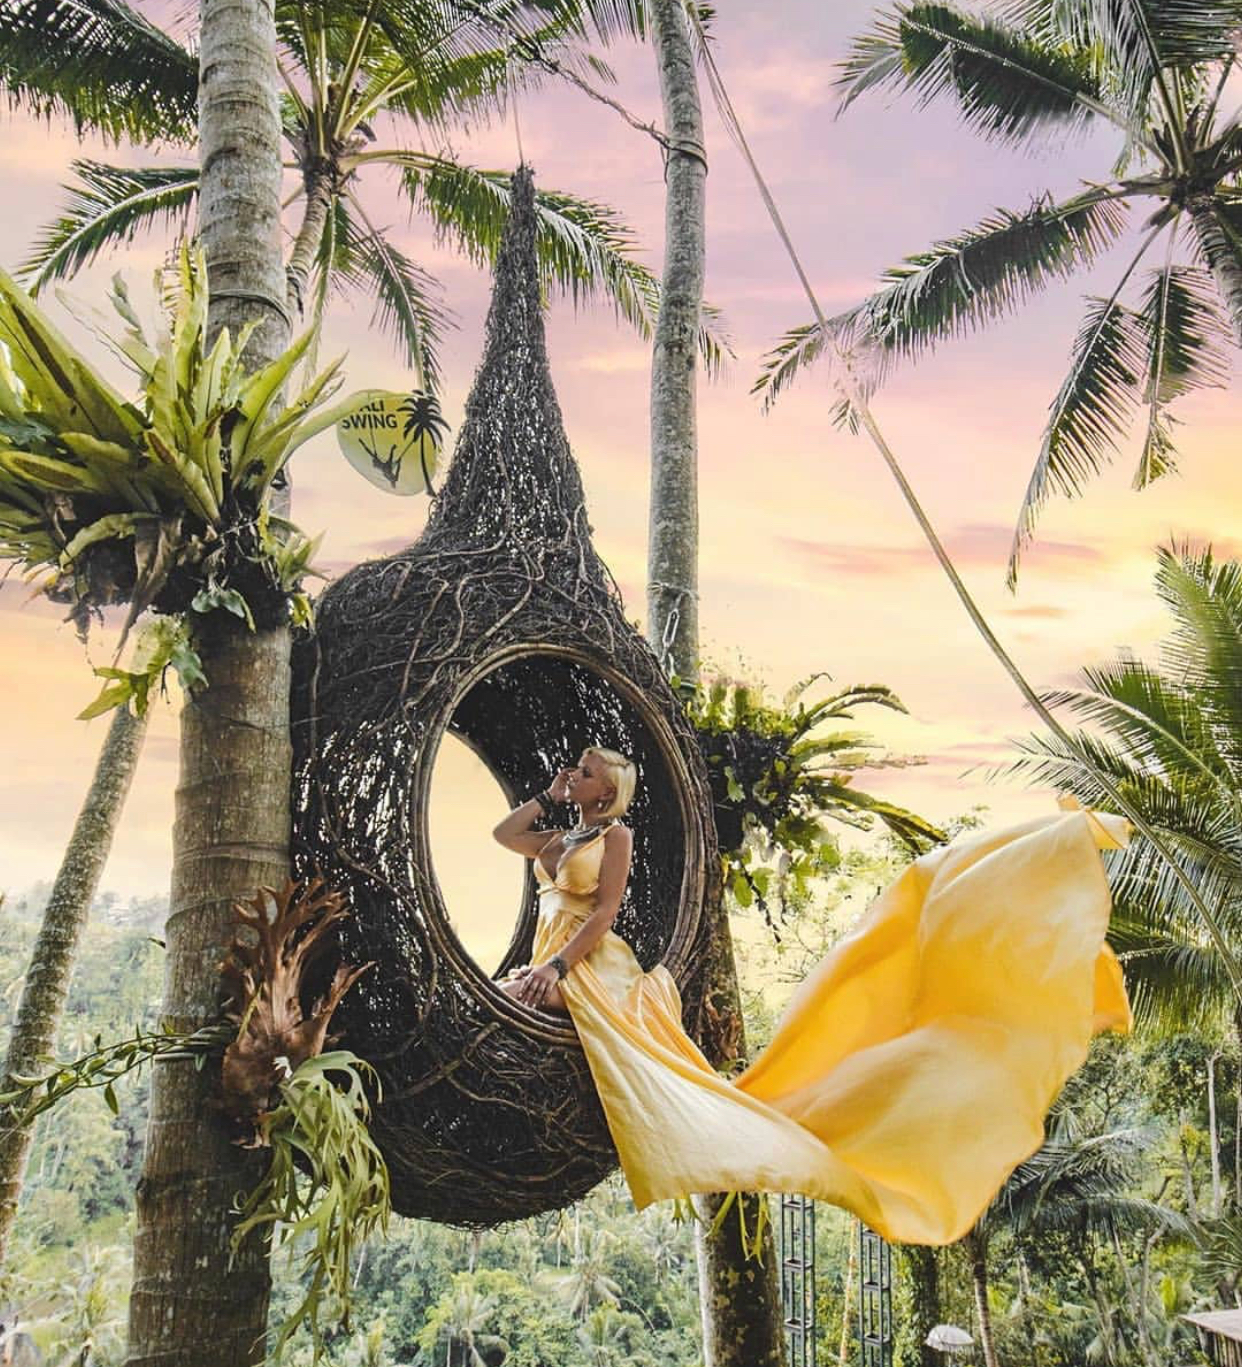 Bali Dramatic Dress Rental Chidi Ashley Travels